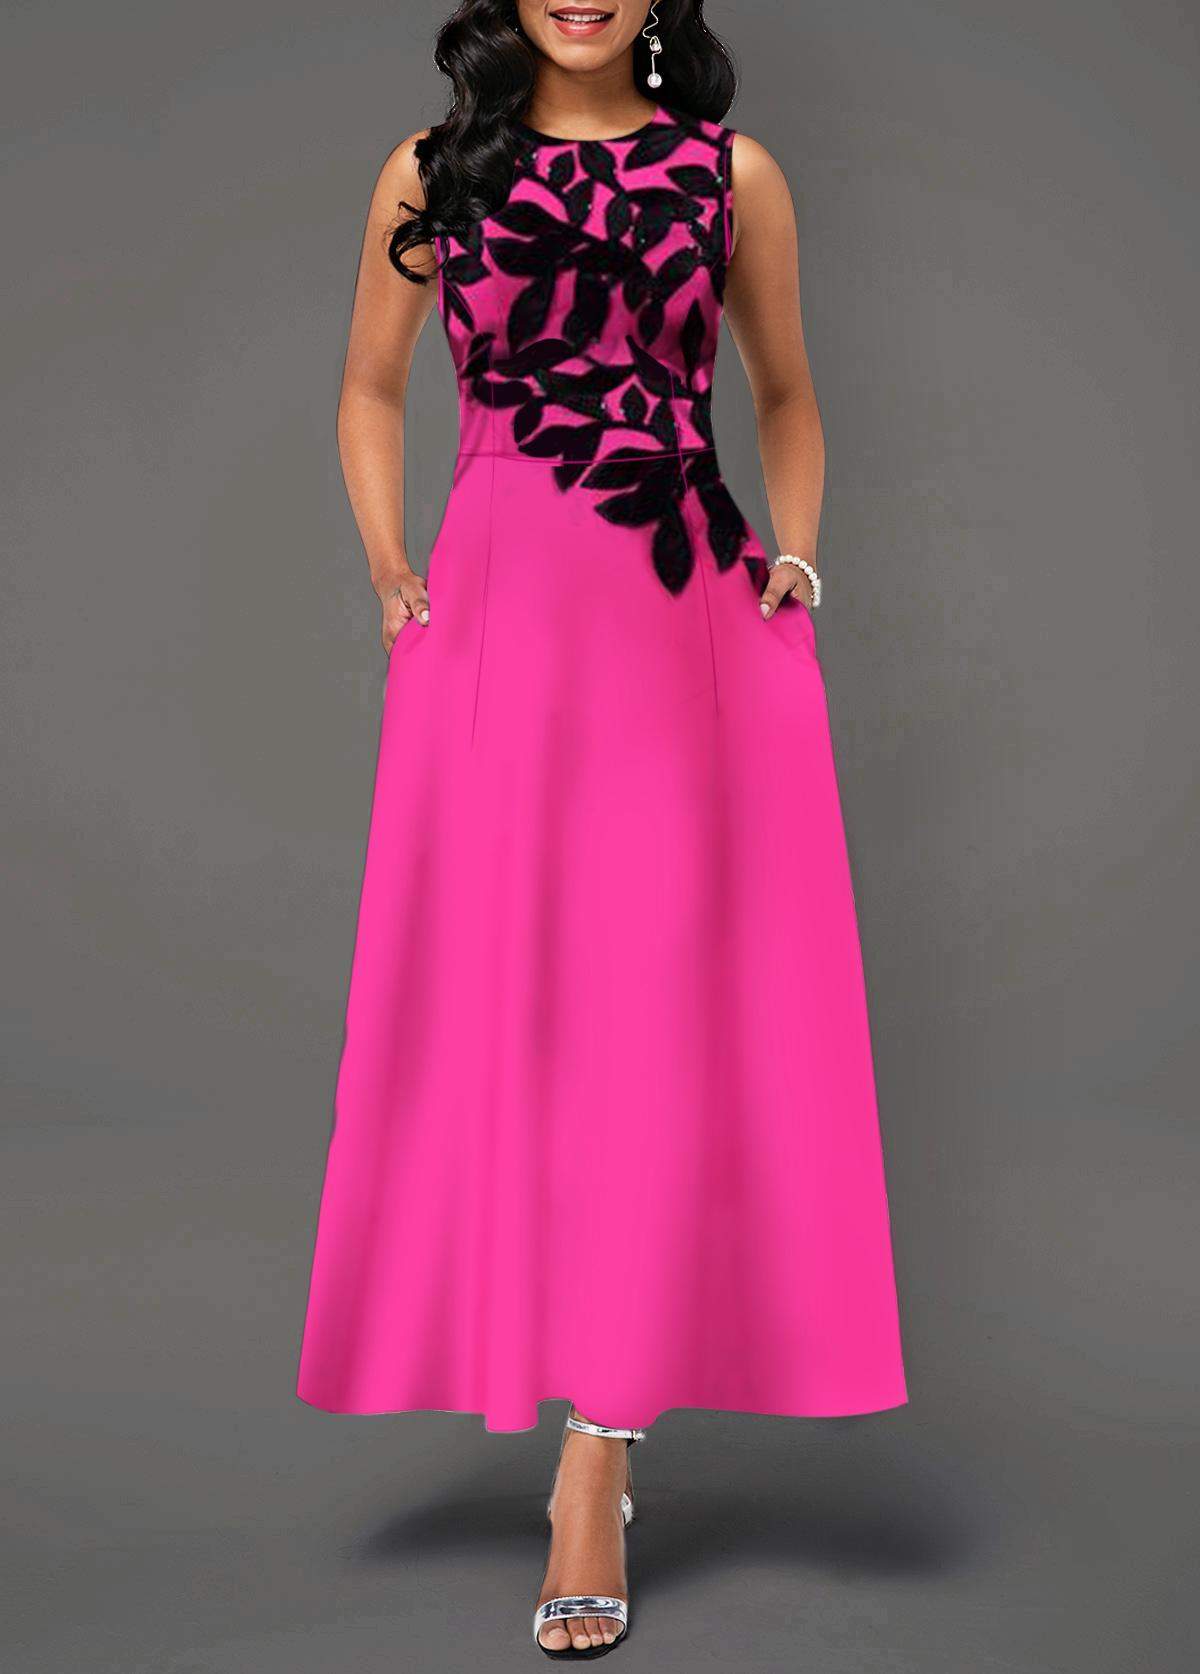 Sleeveless Leaf Print Round Neck High Waist Dress